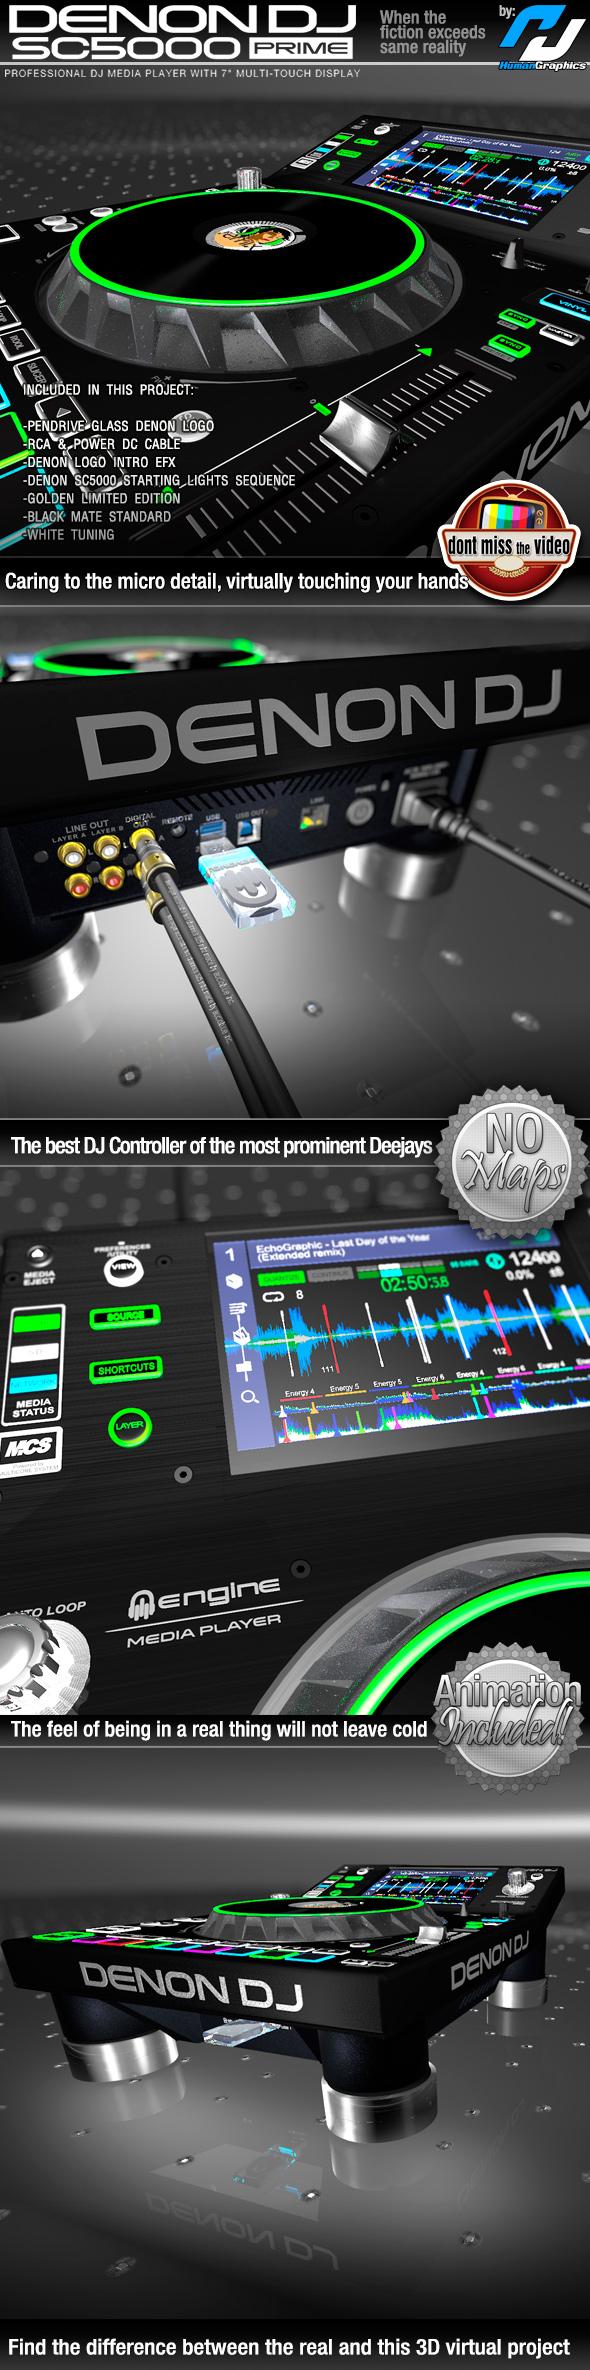 Denon SC5000 Prime - Pro. DJ Media Player, in 3 different skins - 3DOcean Item for Sale